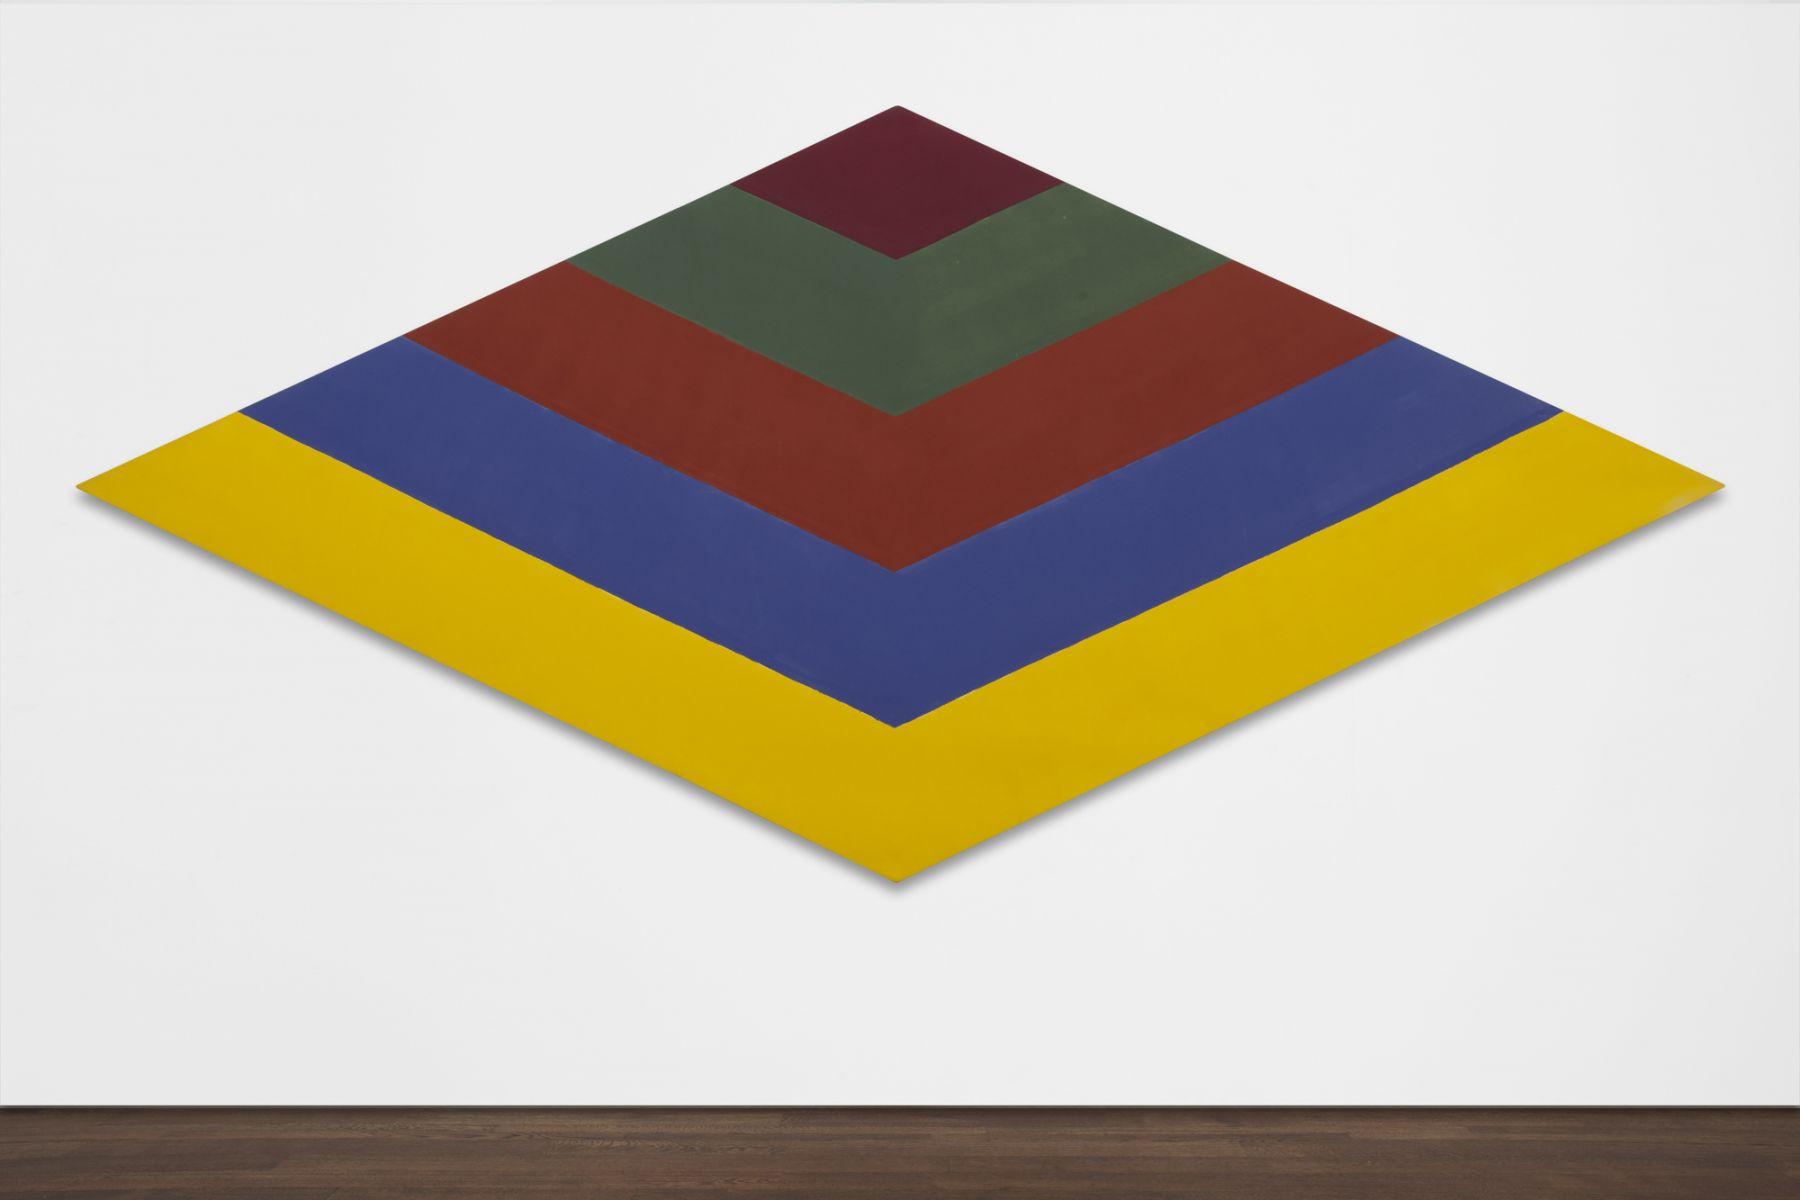 Kenneth Noland,Mach II,1964, acrylic resin on canvas, 98 x 208 inches